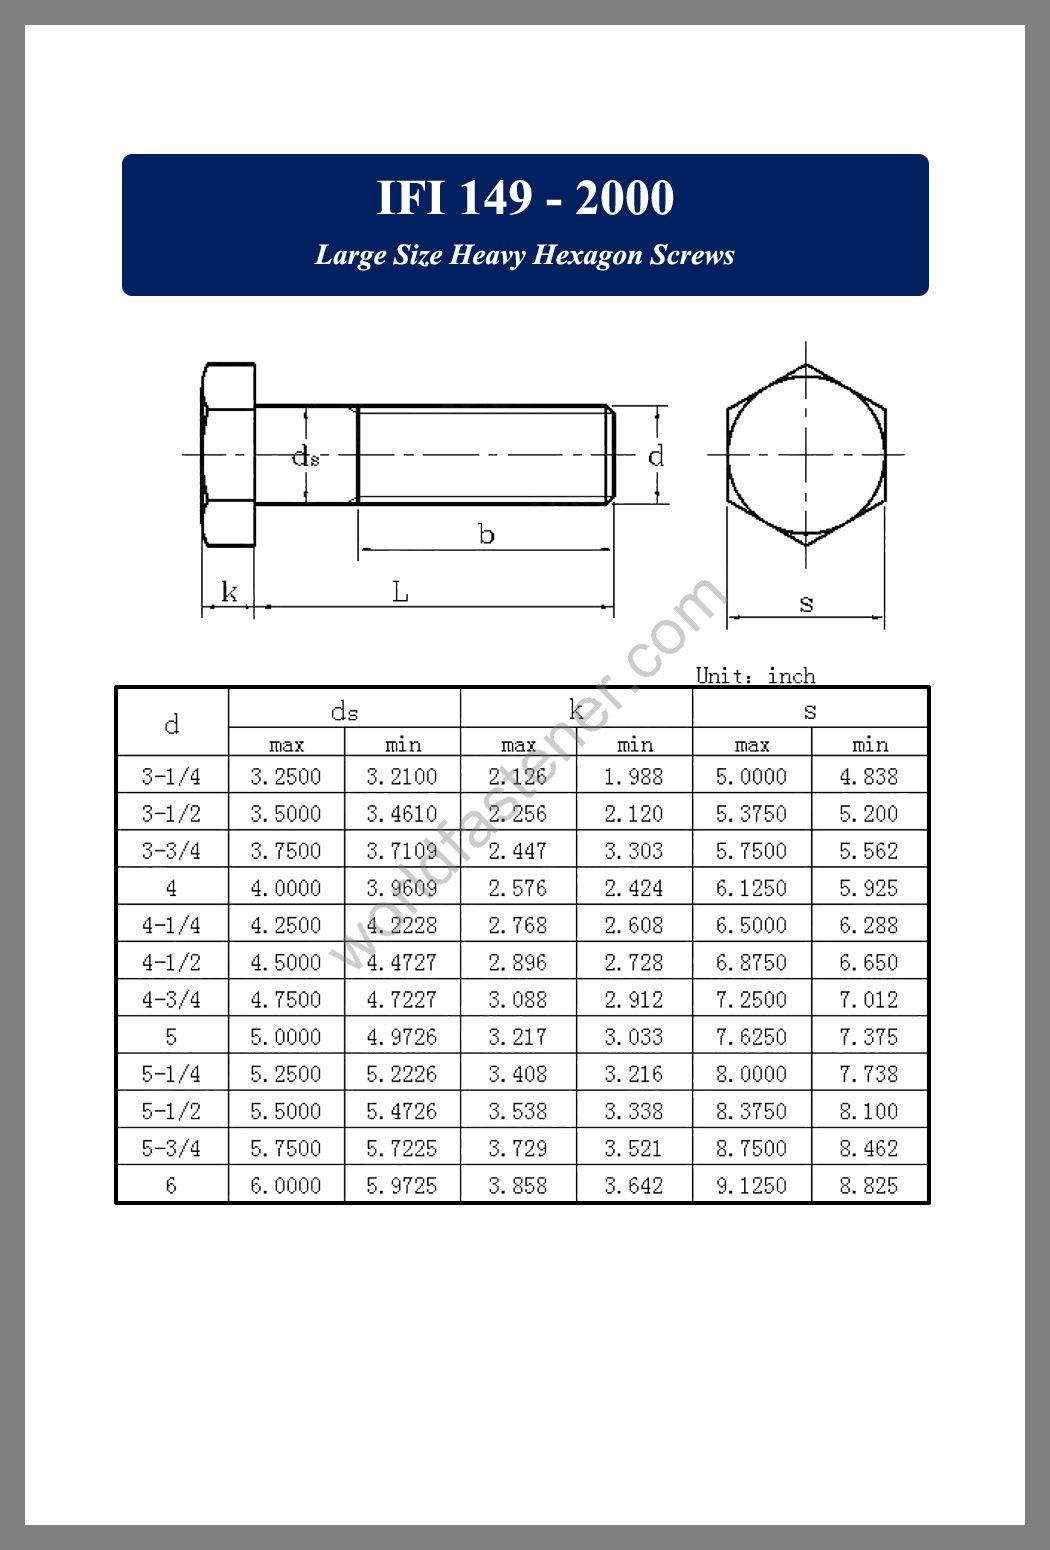 IFI 149, IFI 149 Large Size Heavy Hexagon Screws, fastener, screw, bolt, IFI bolt, IFI fastener